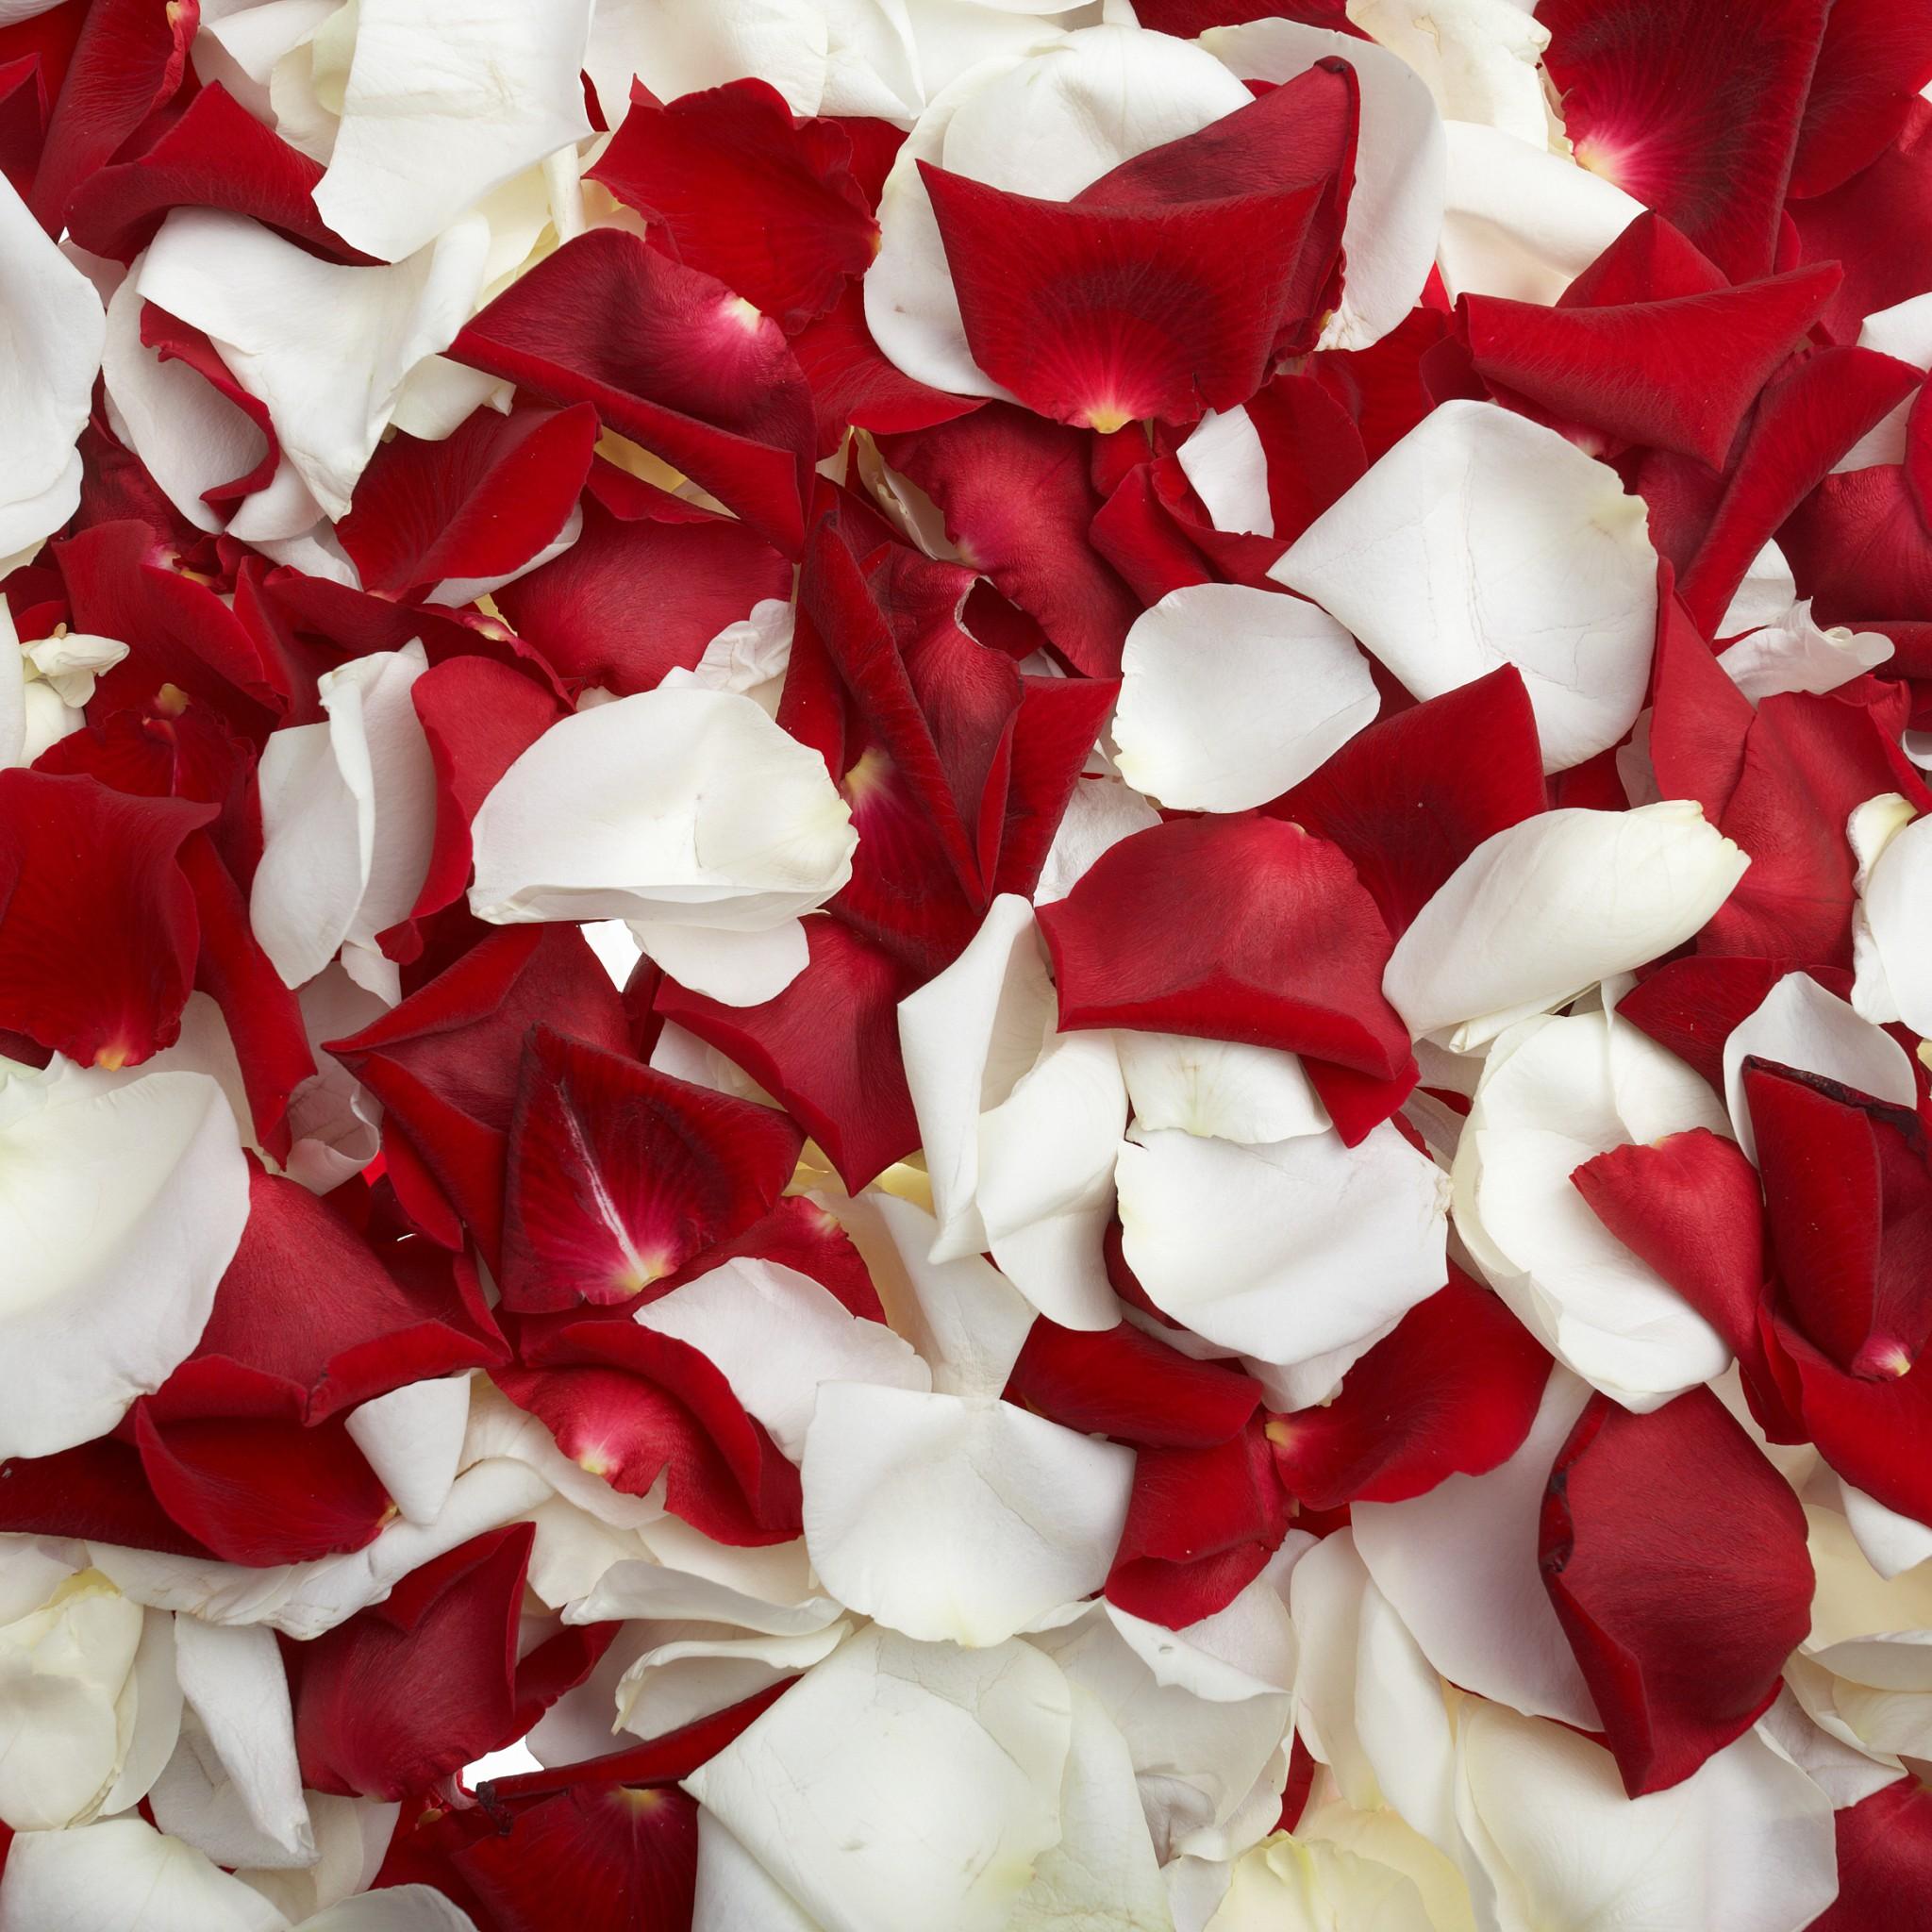 30 wallpaper uri retina pentru iphone ipod touch ipad si - Red rose petals wallpaper ...